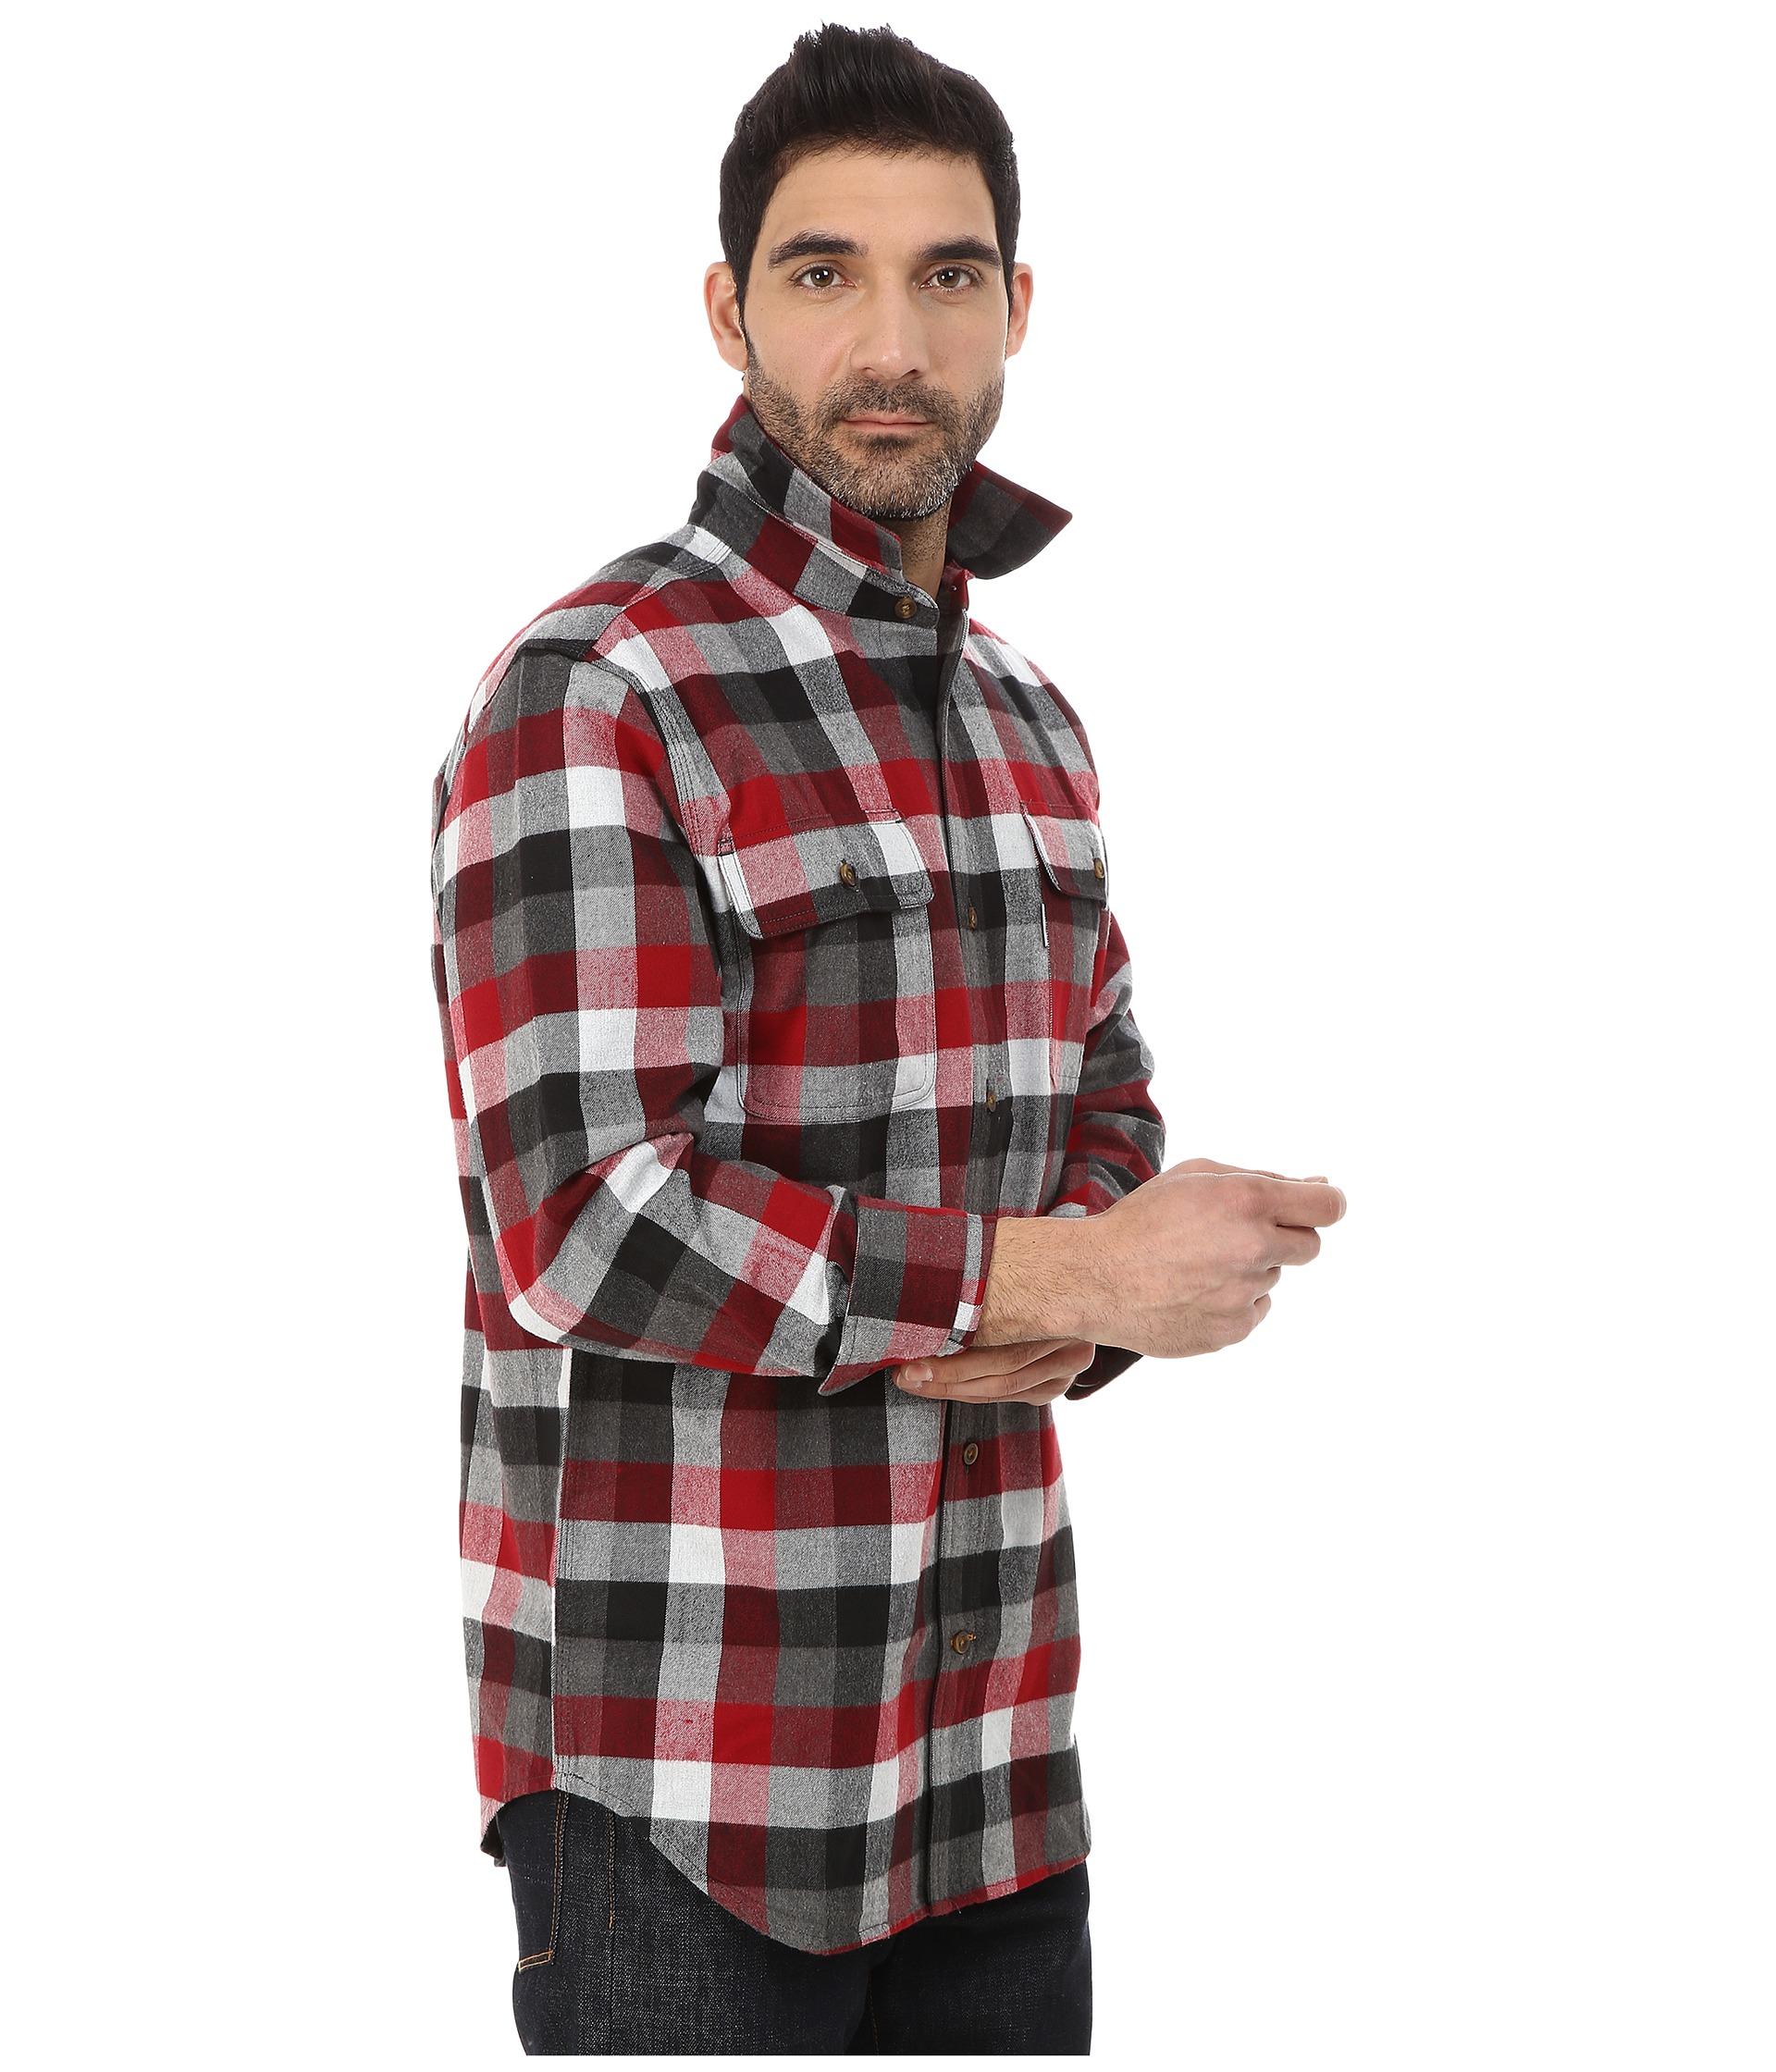 tani nowy design rozmiar 7 Hubbard Plaid Shirt